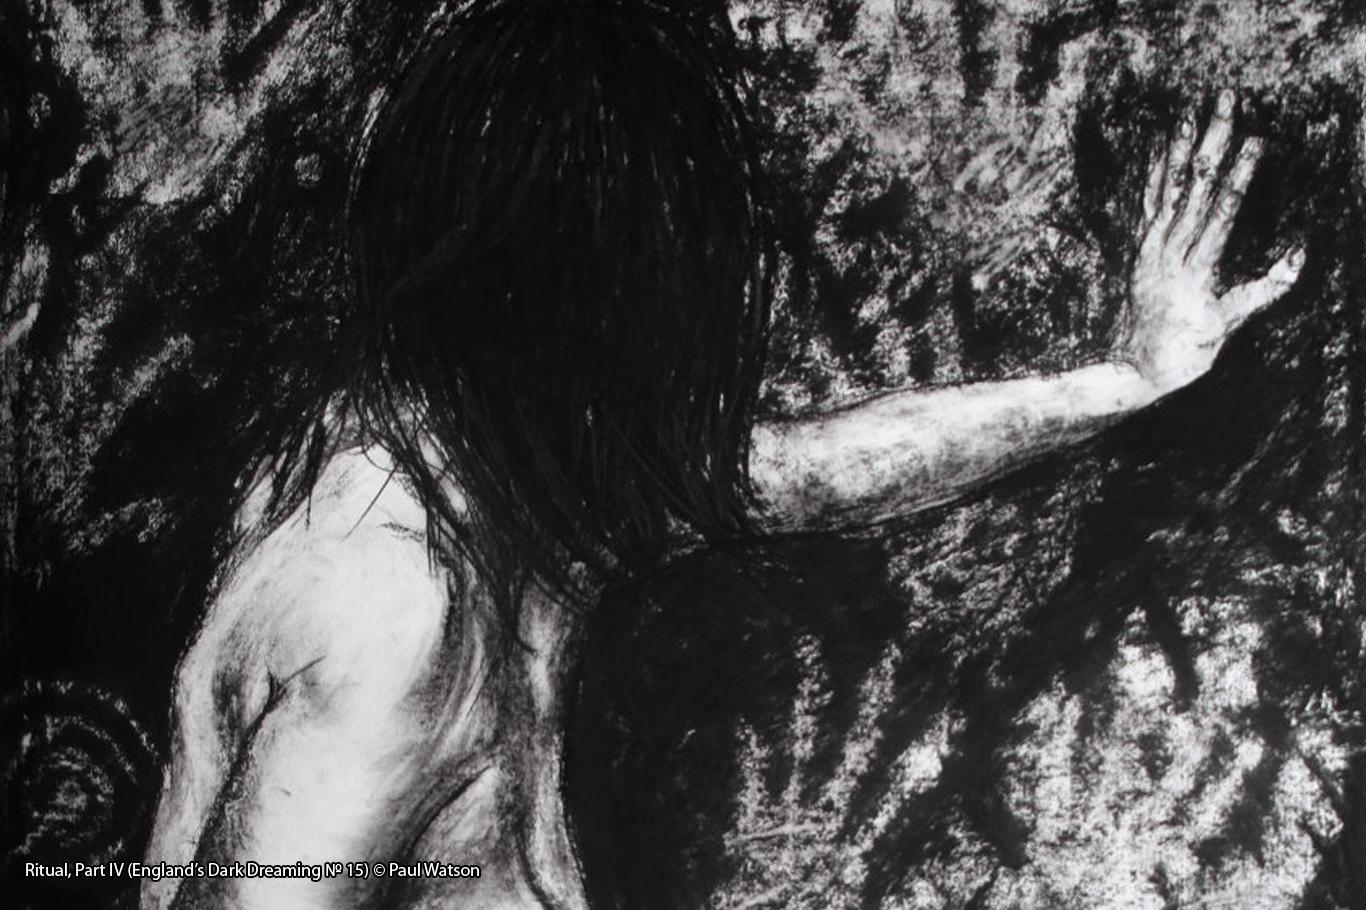 Ritual, Part IV (England's Dark Dreaming № 15) © Paul Watson Charcoal drawing of a woman making rock art handprints